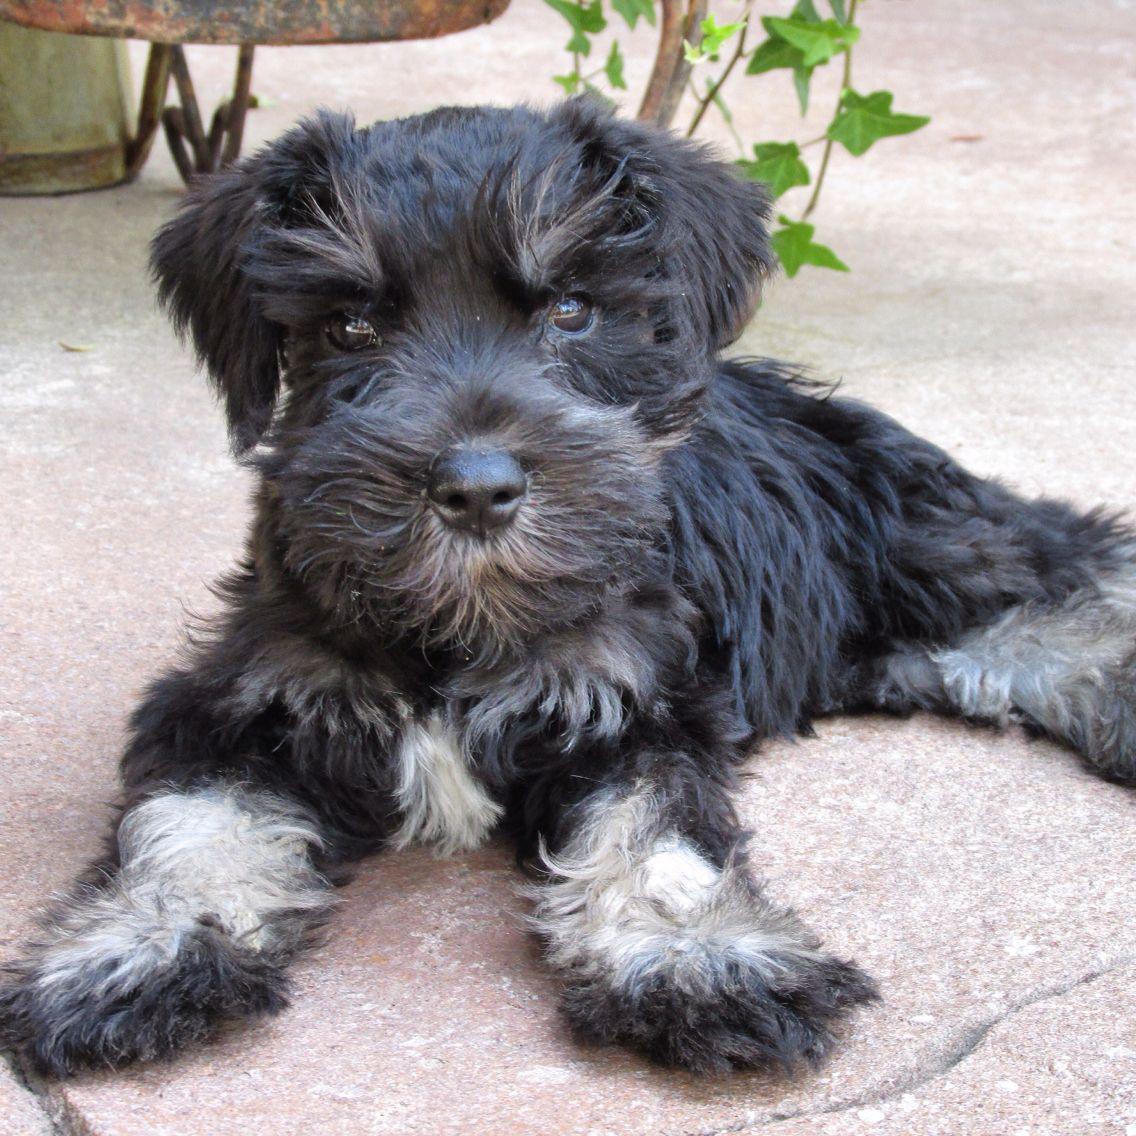 Mini schnauzer..8 weeks old. Baby Tucker. He's perfect ...